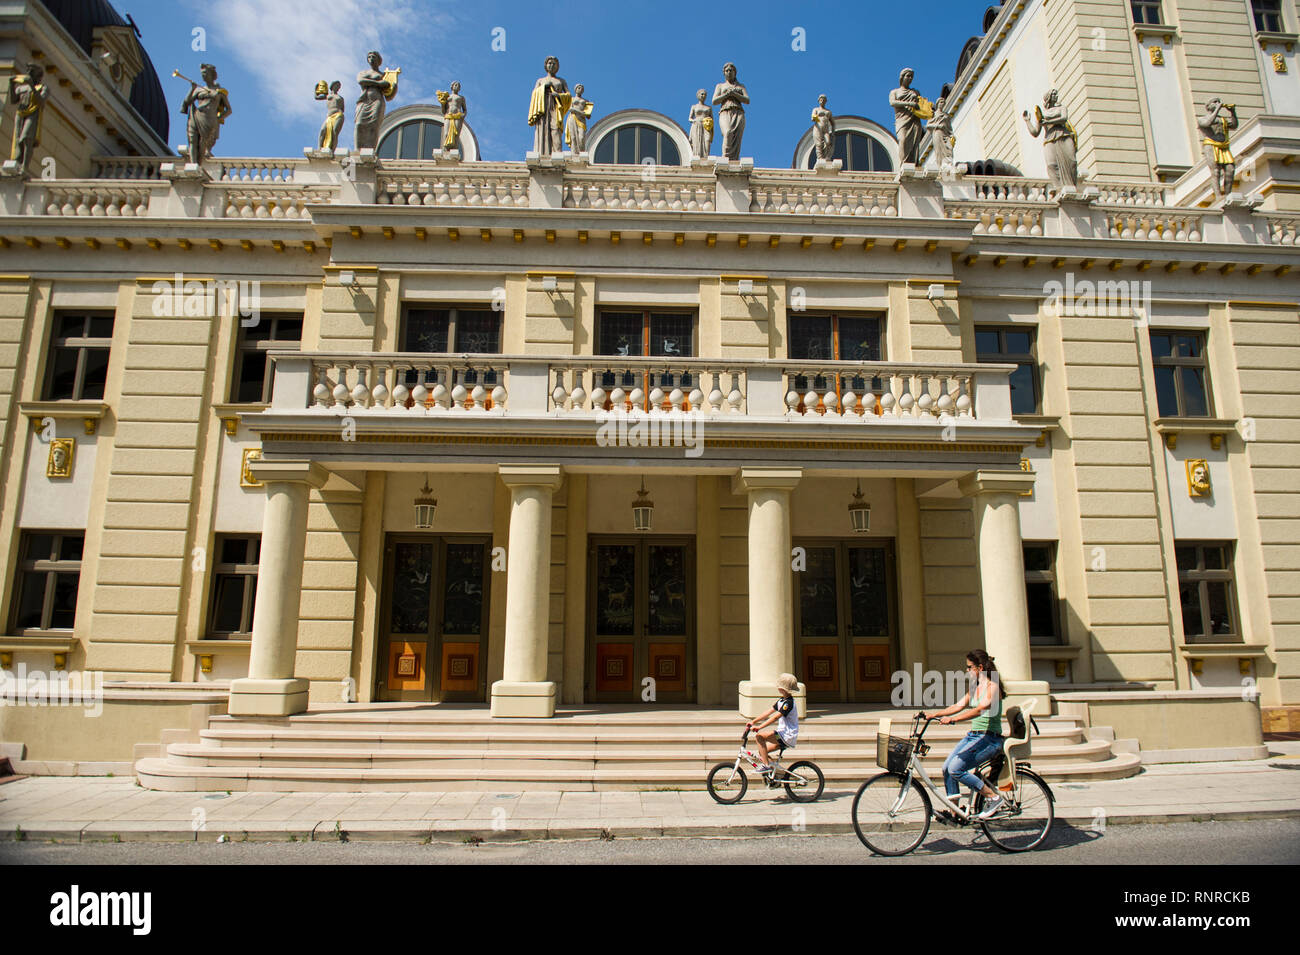 Macedonian National Theatre, Skopje, Macedonia - Stock Image